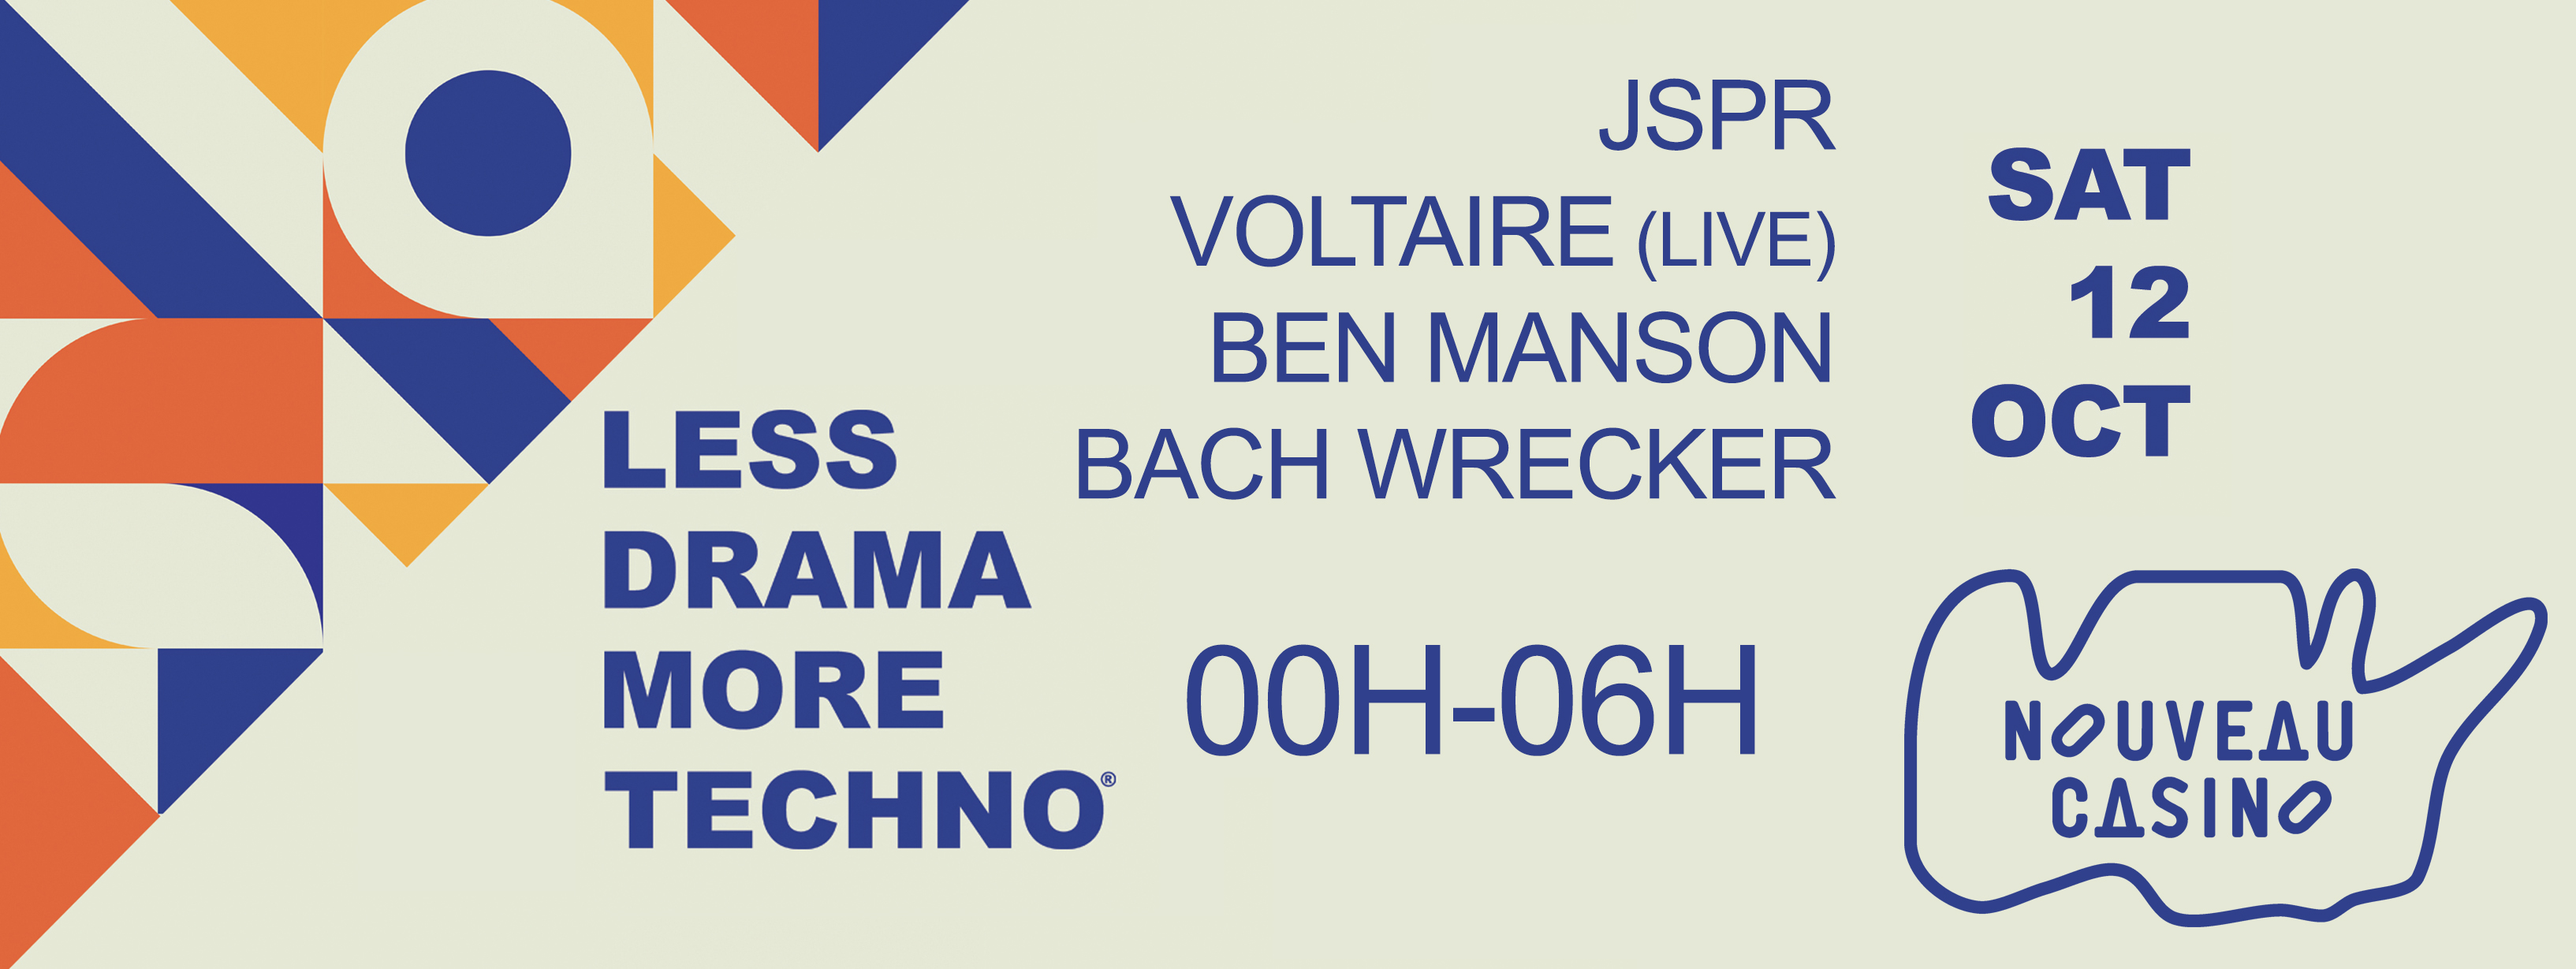 Less Drama More Techno feat JSPR, Voltaire & Ben Manson